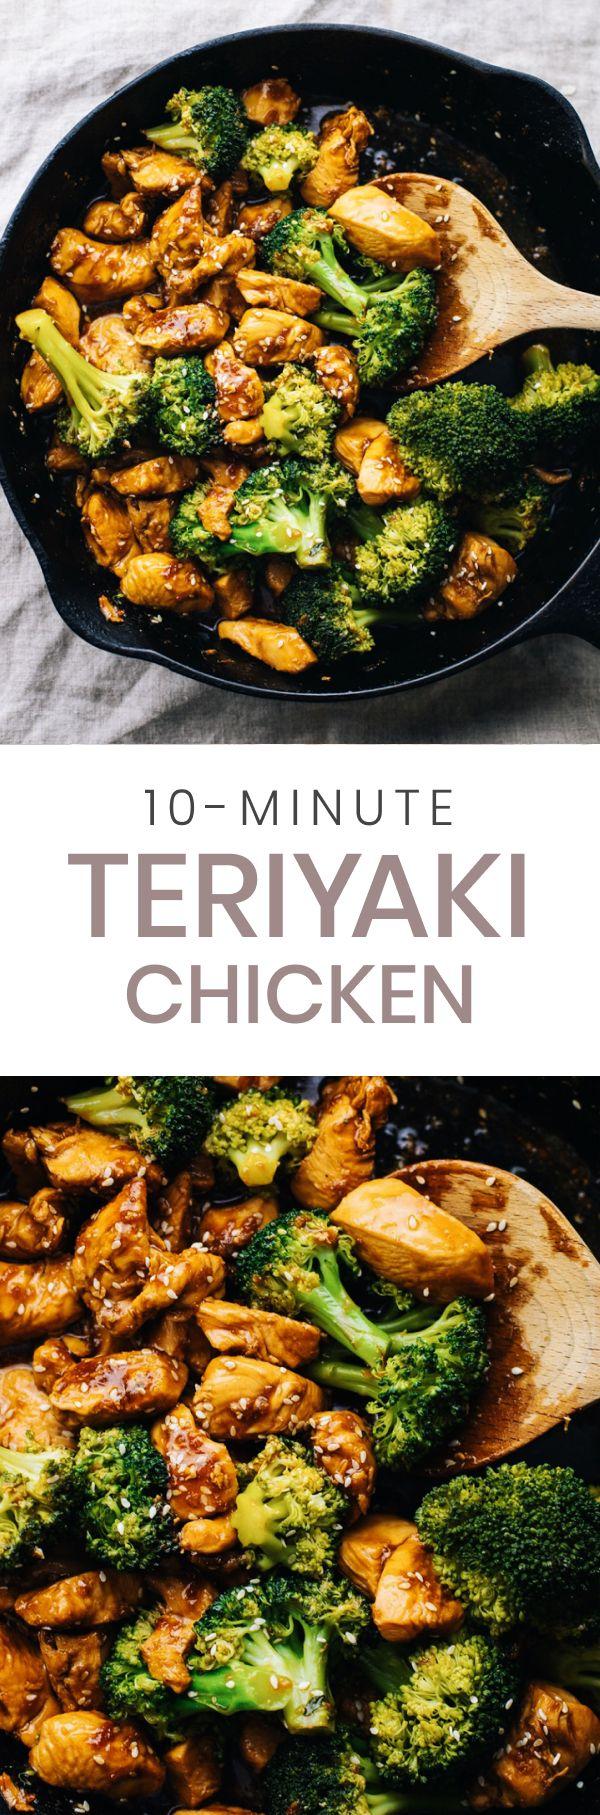 10-Minute Teriyaki Chicken & Broccoli #quickeasydinners